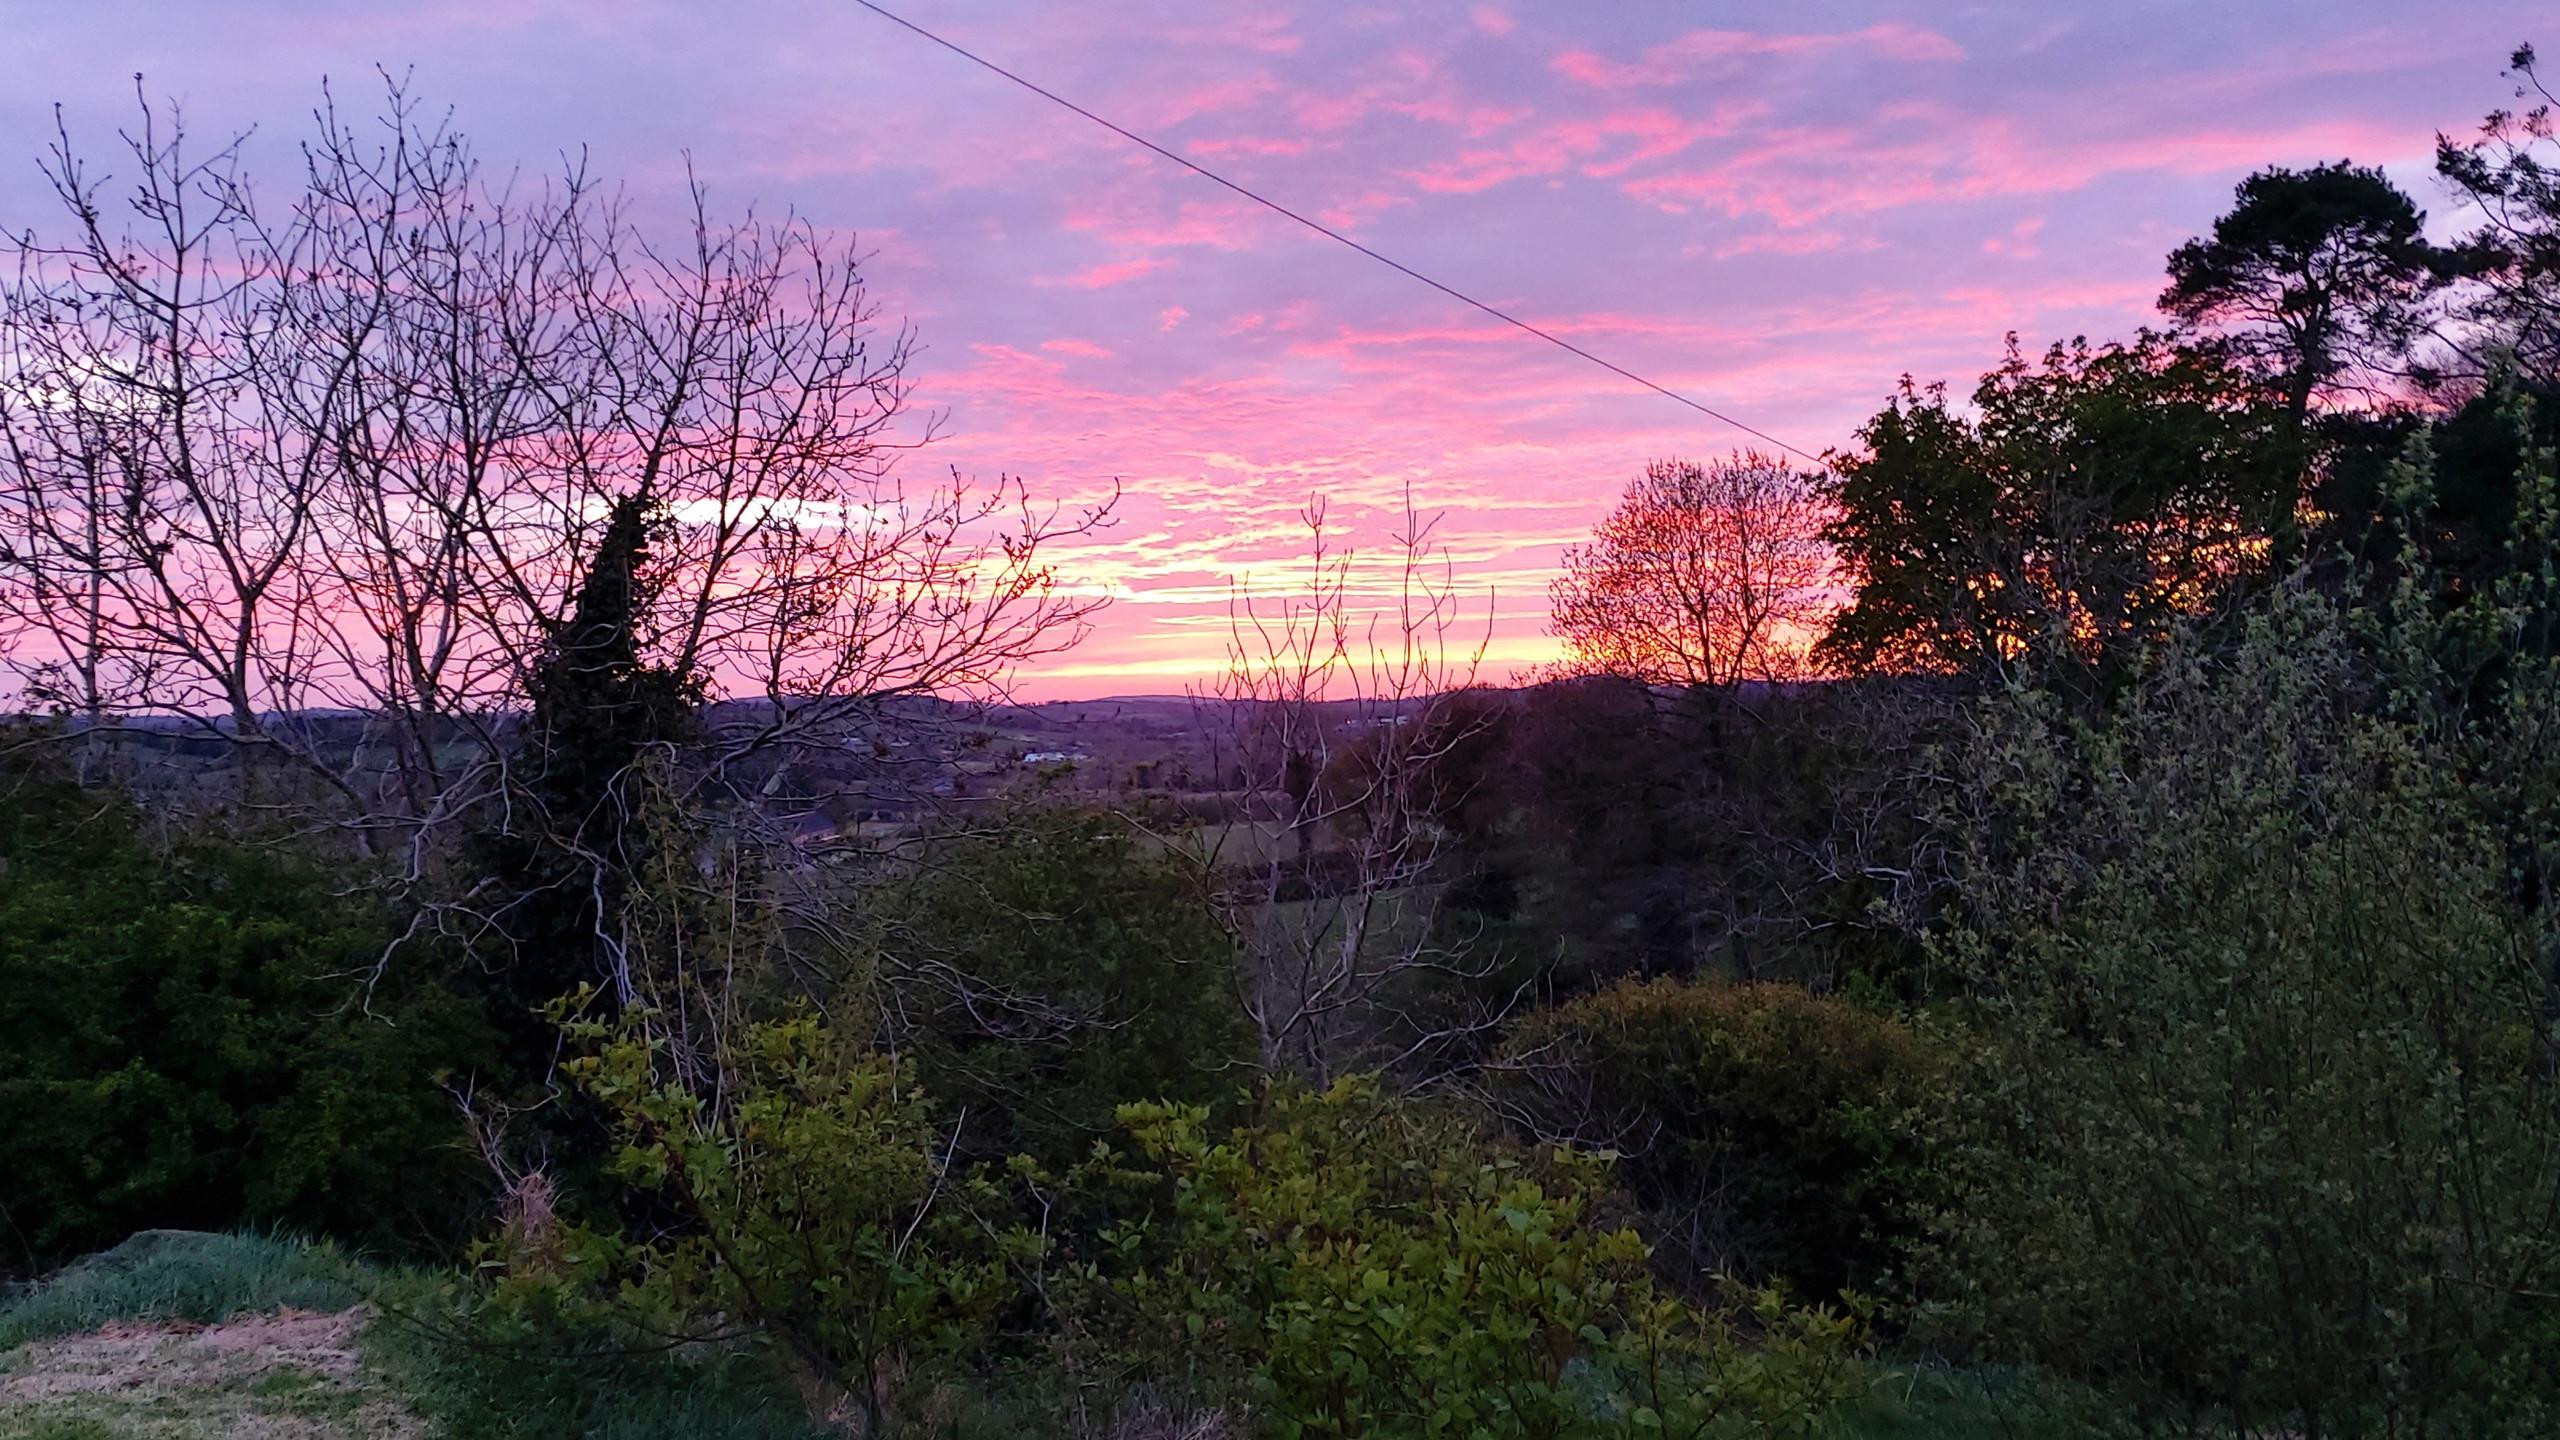 Sunset over my garden